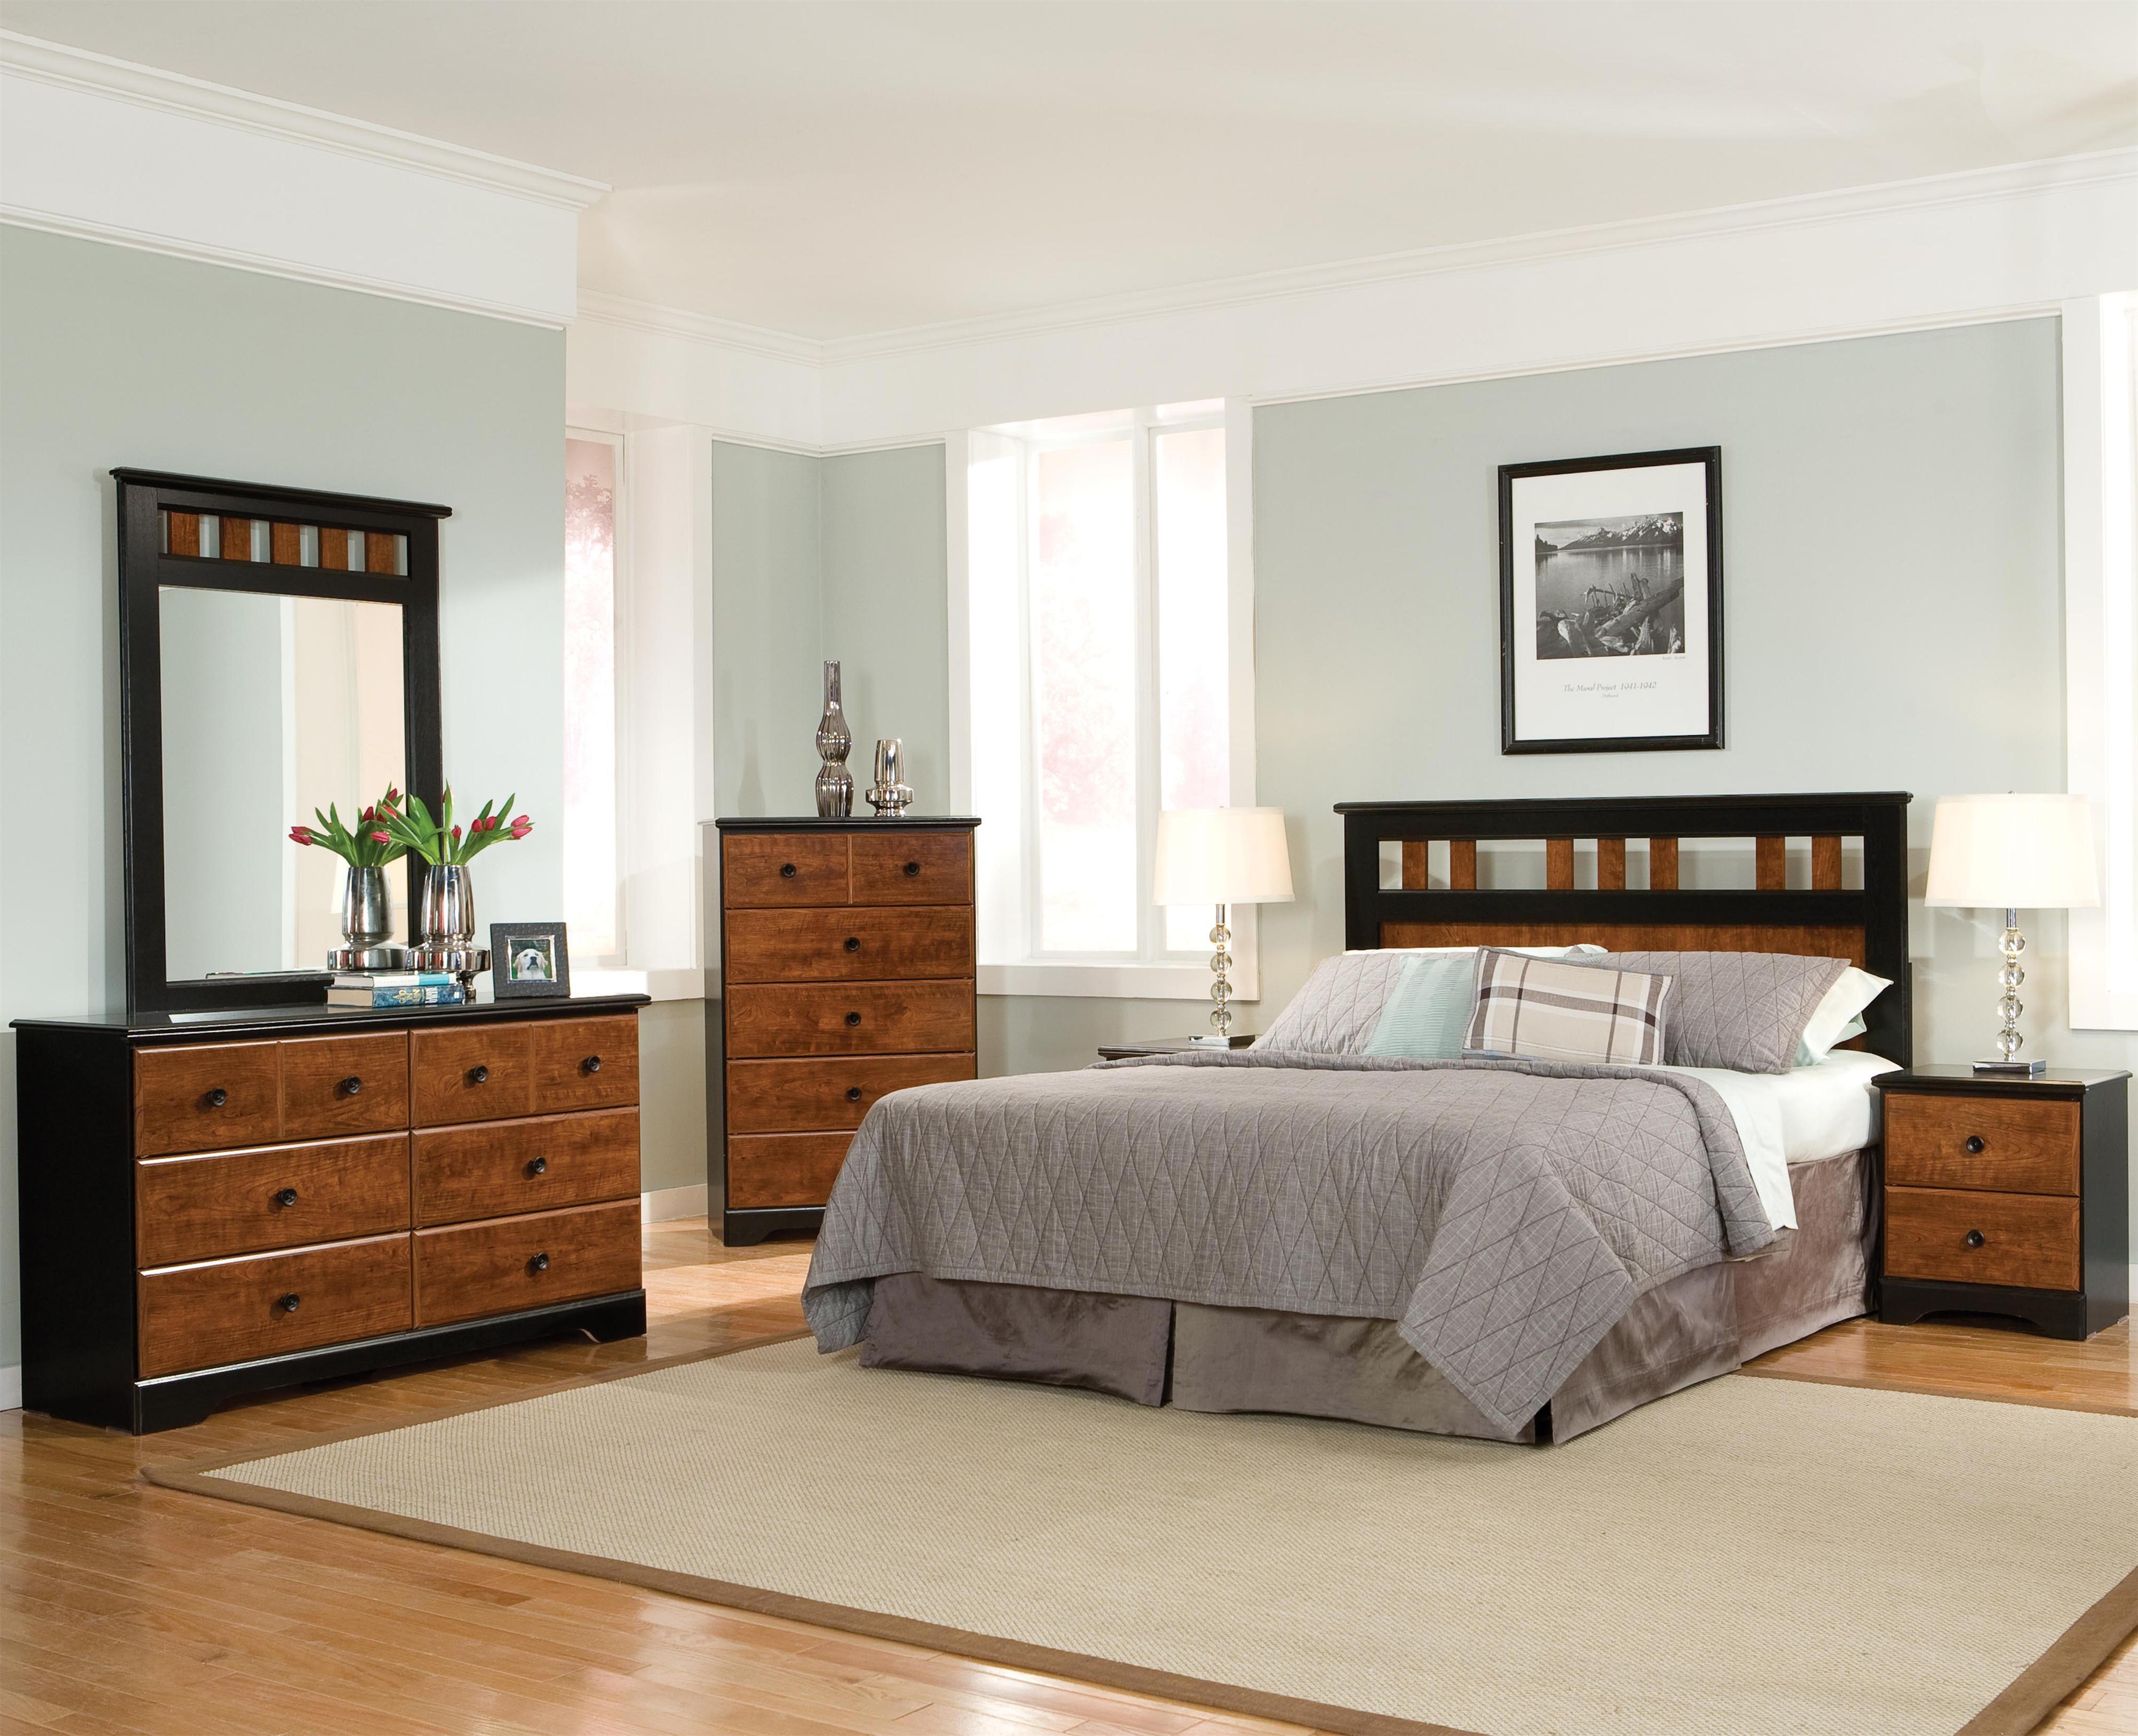 Standard Furniture Steelwood Twin Bedroom Group - Item Number: 61200 T Bedroom Group 1